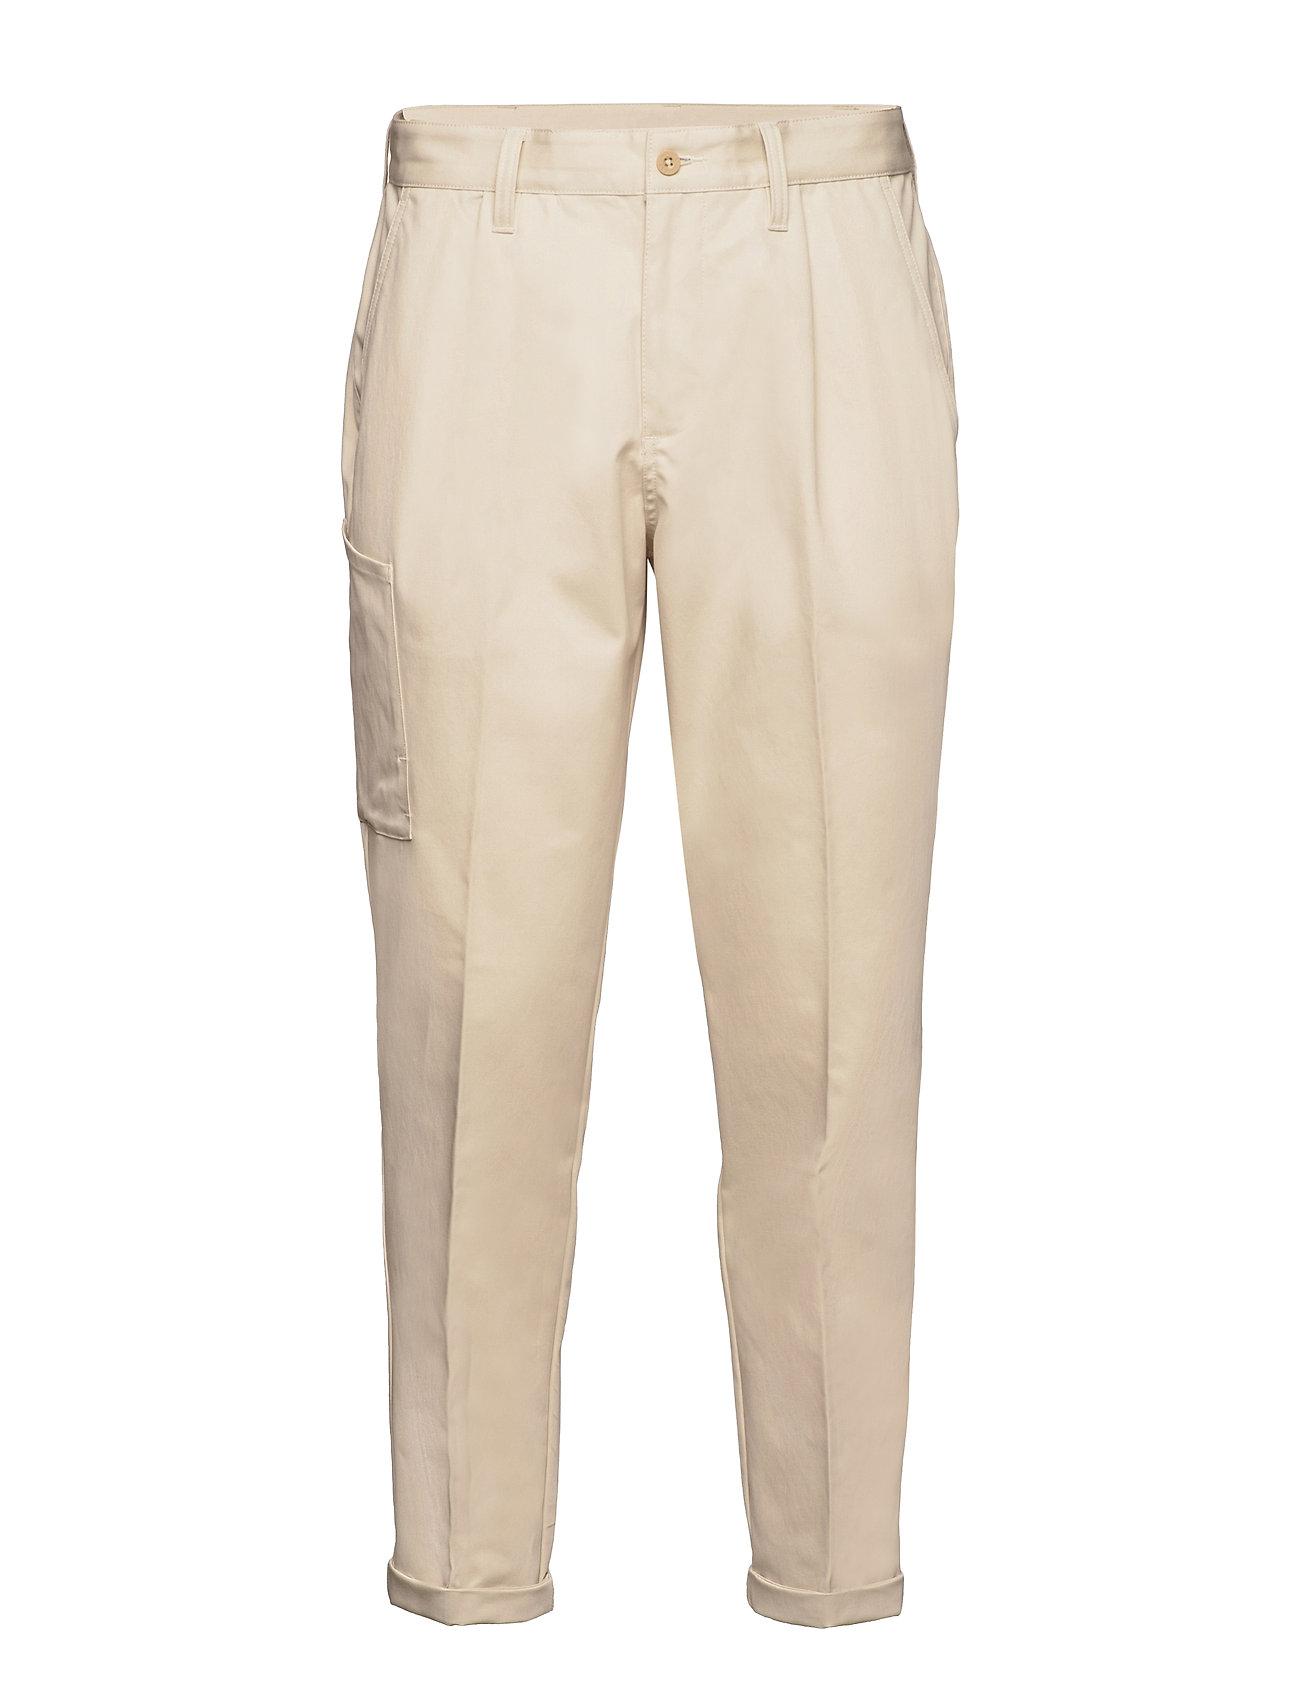 Adcrs Chno Pnt Sport Pants Beige Adidas Golf